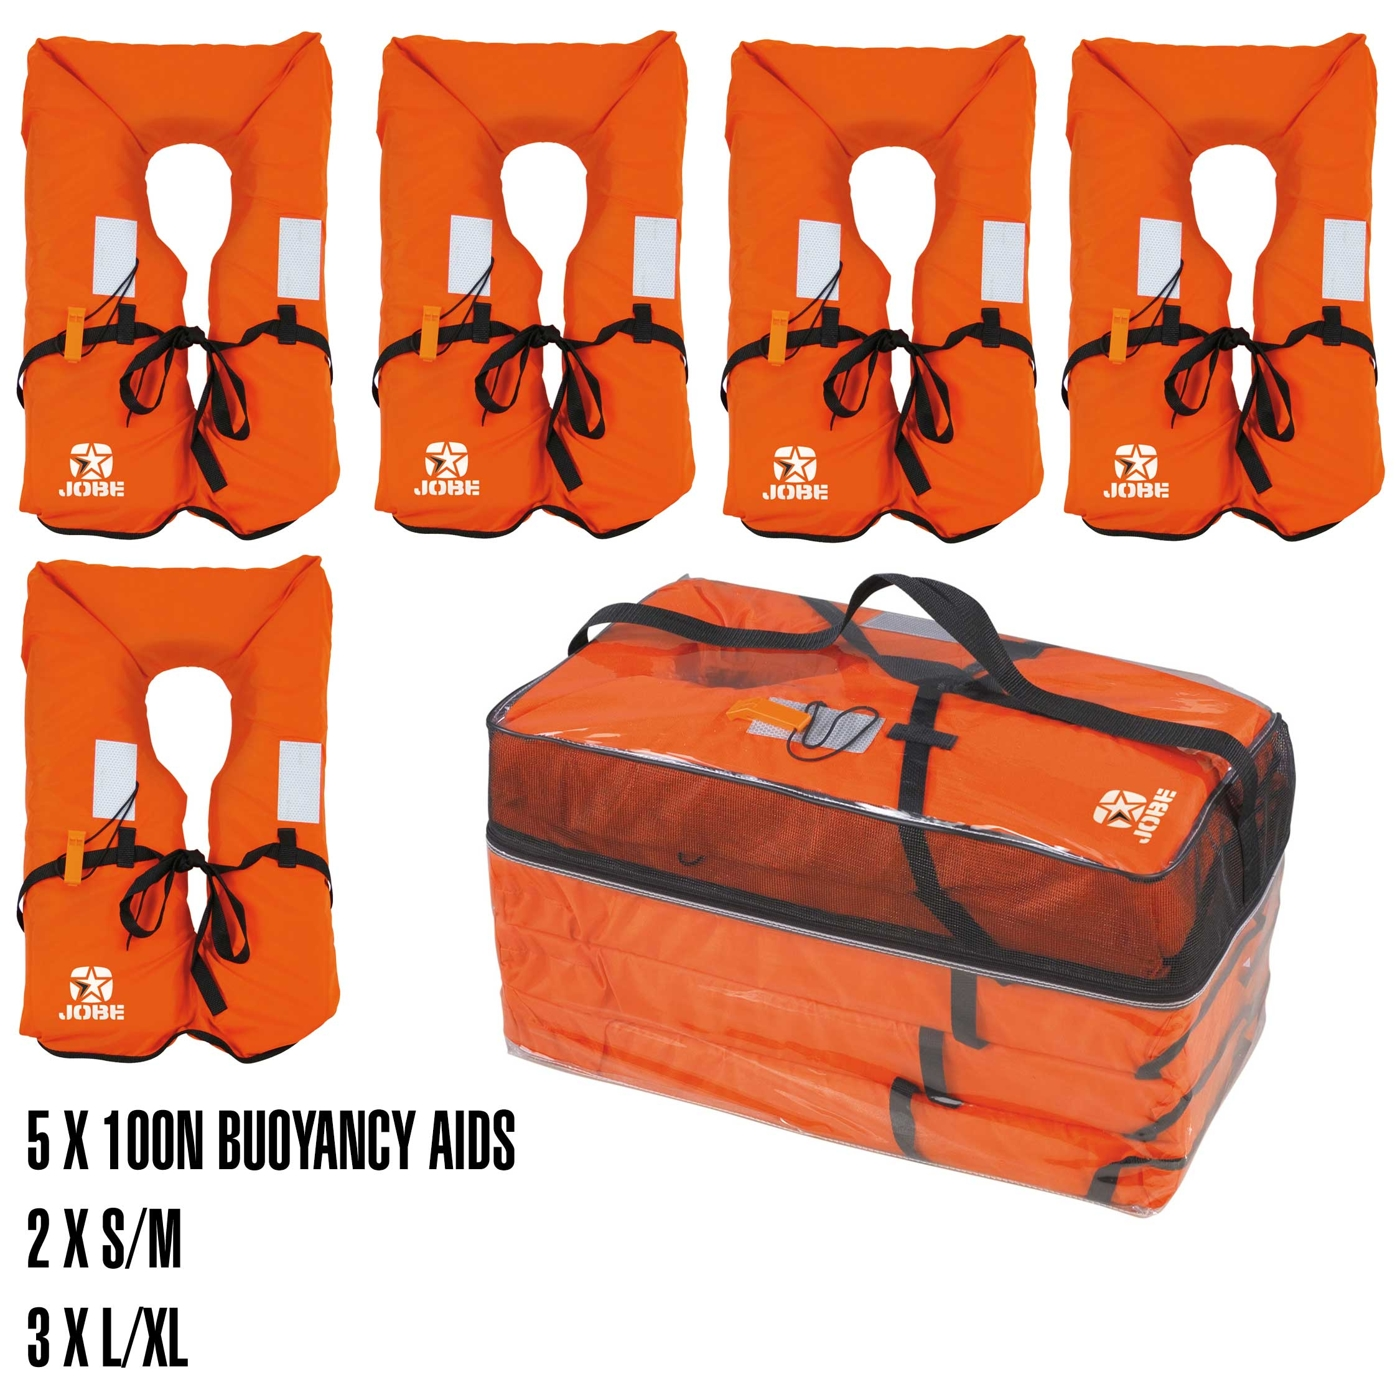 Jobe_Lifejacket_Package_Easy_Boating_Set_of_5